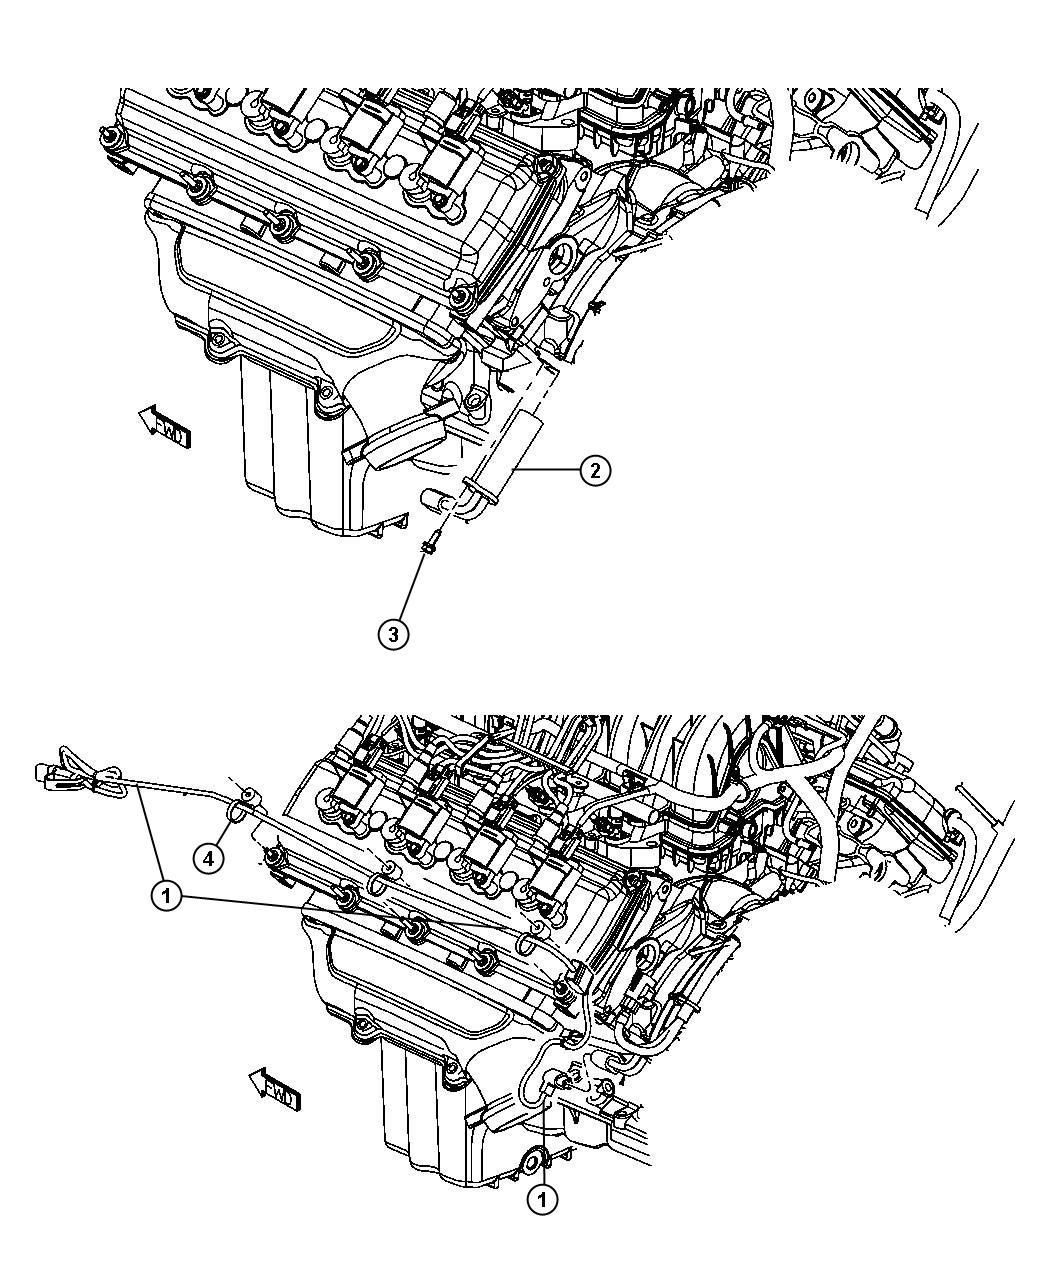 Dodge Magnum Engine Cylinder Block Heater 5 7l 5 7l Hemi Multi Displacement Engine